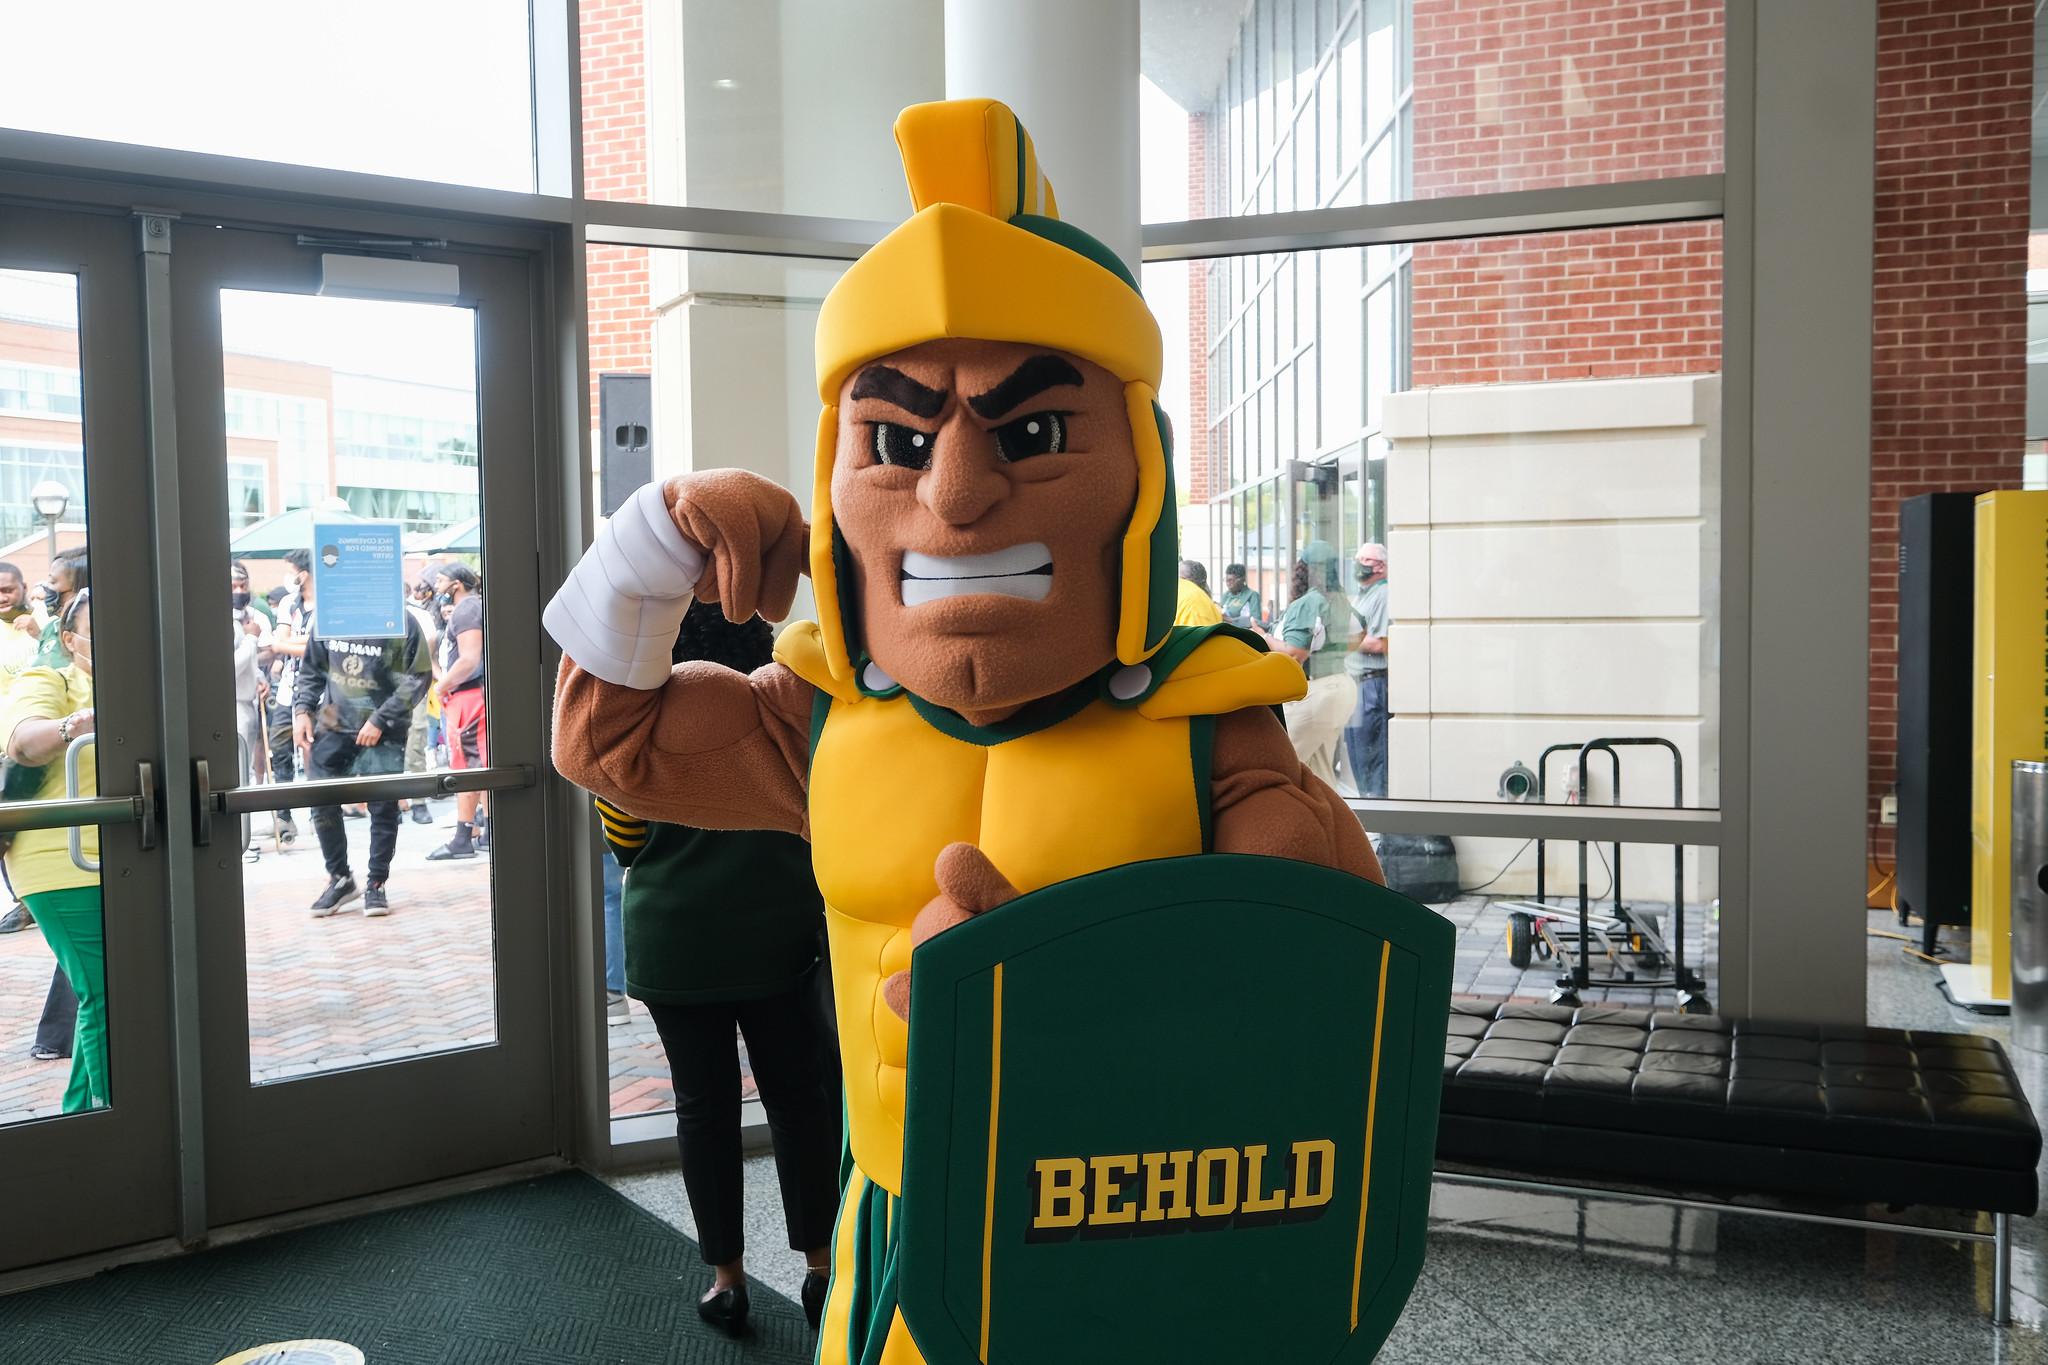 Norfolk State University Mascot